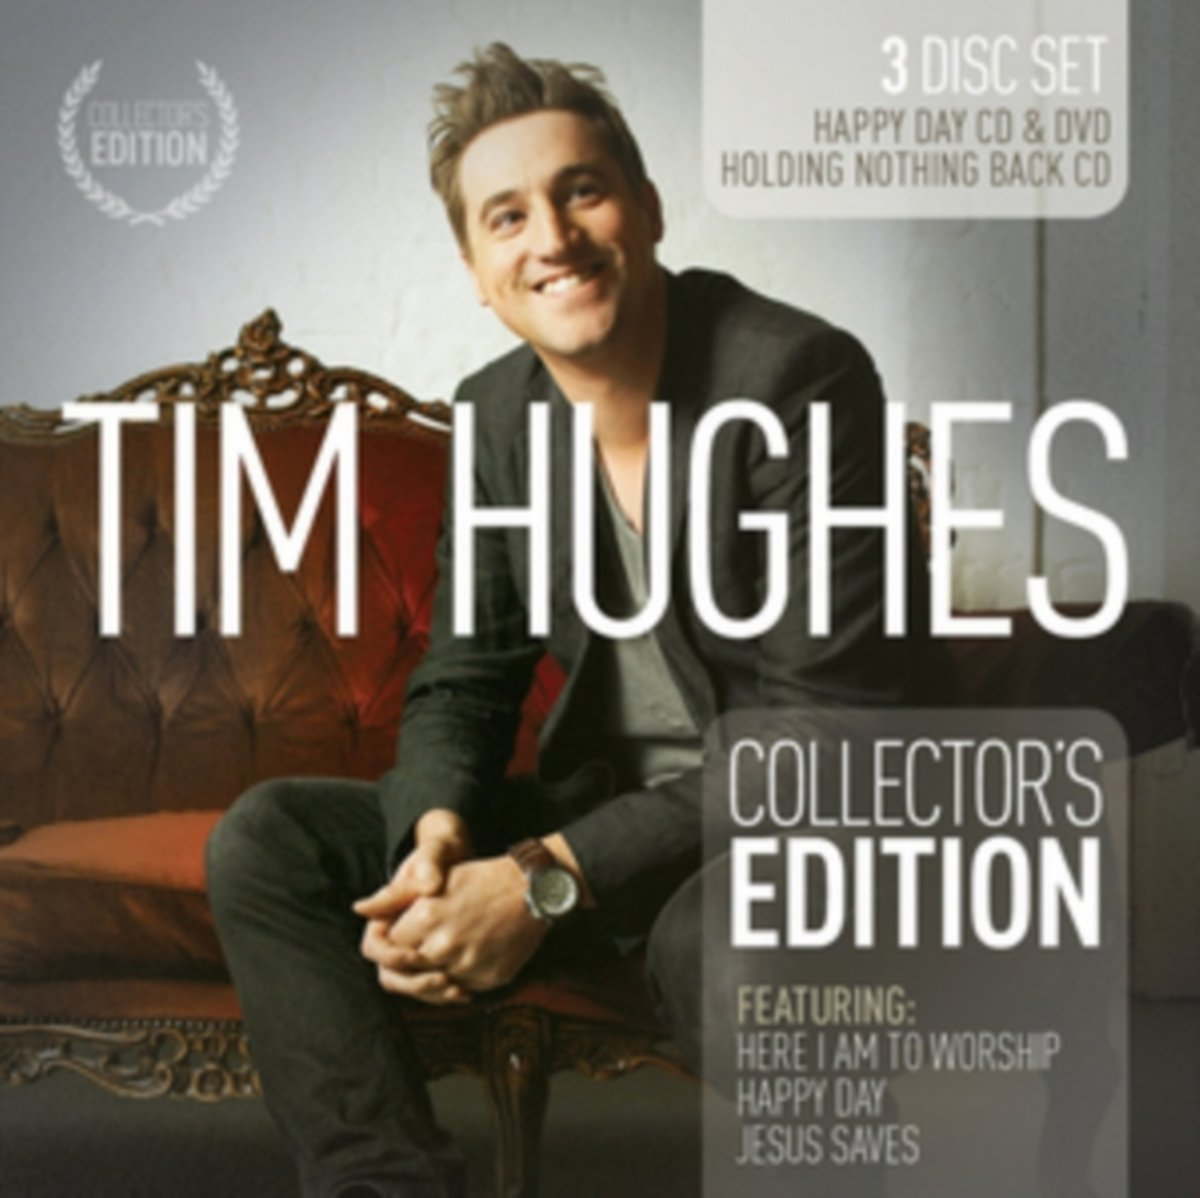 Collectors Edition (3Cd)